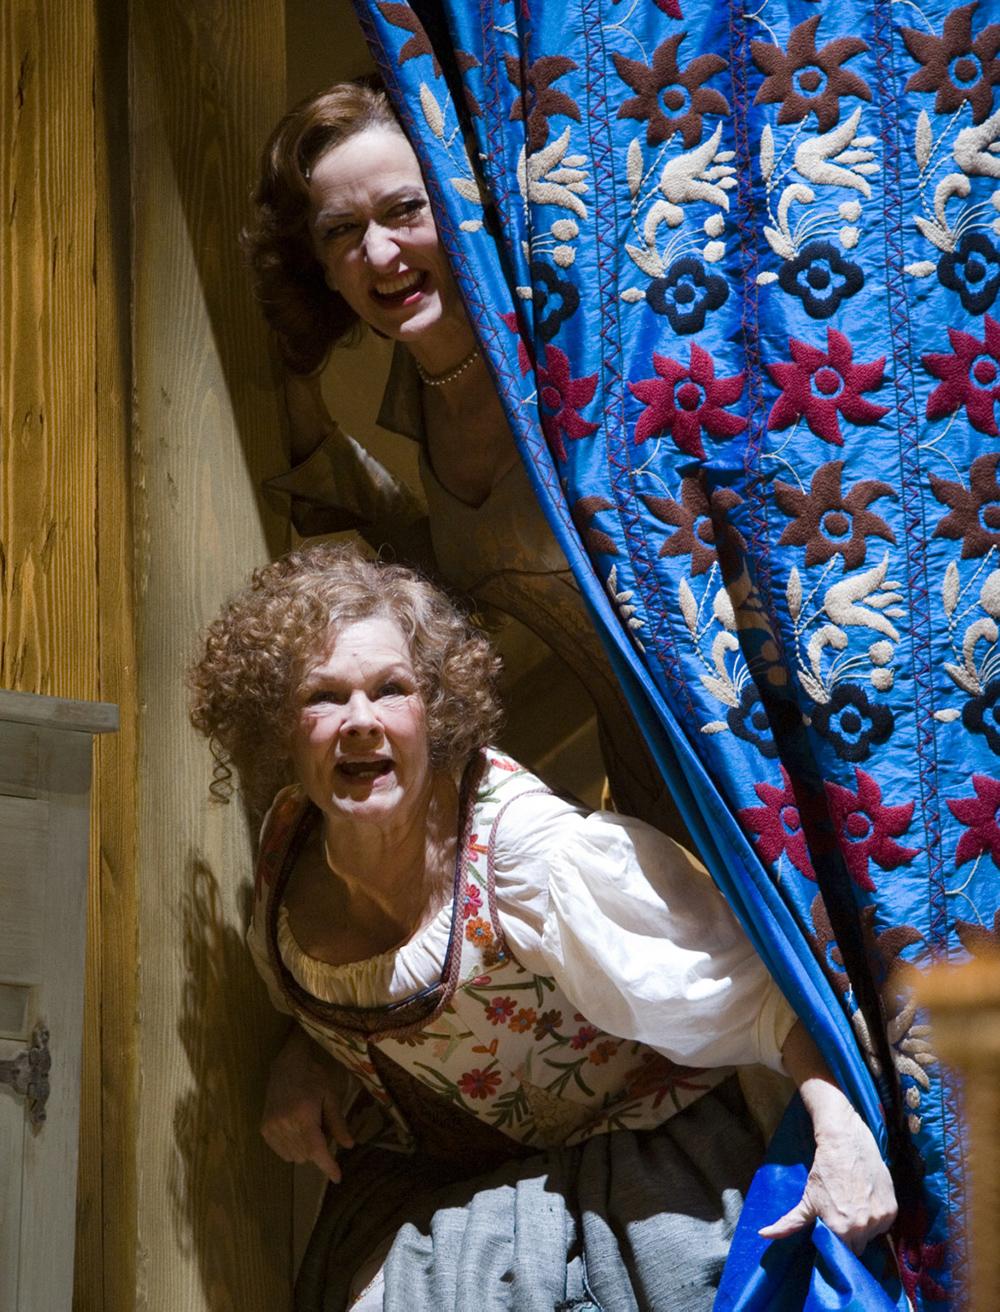 RSC-The Merry Wives of Windsor _2006_Stewart Hemley _c_ RSC_108561